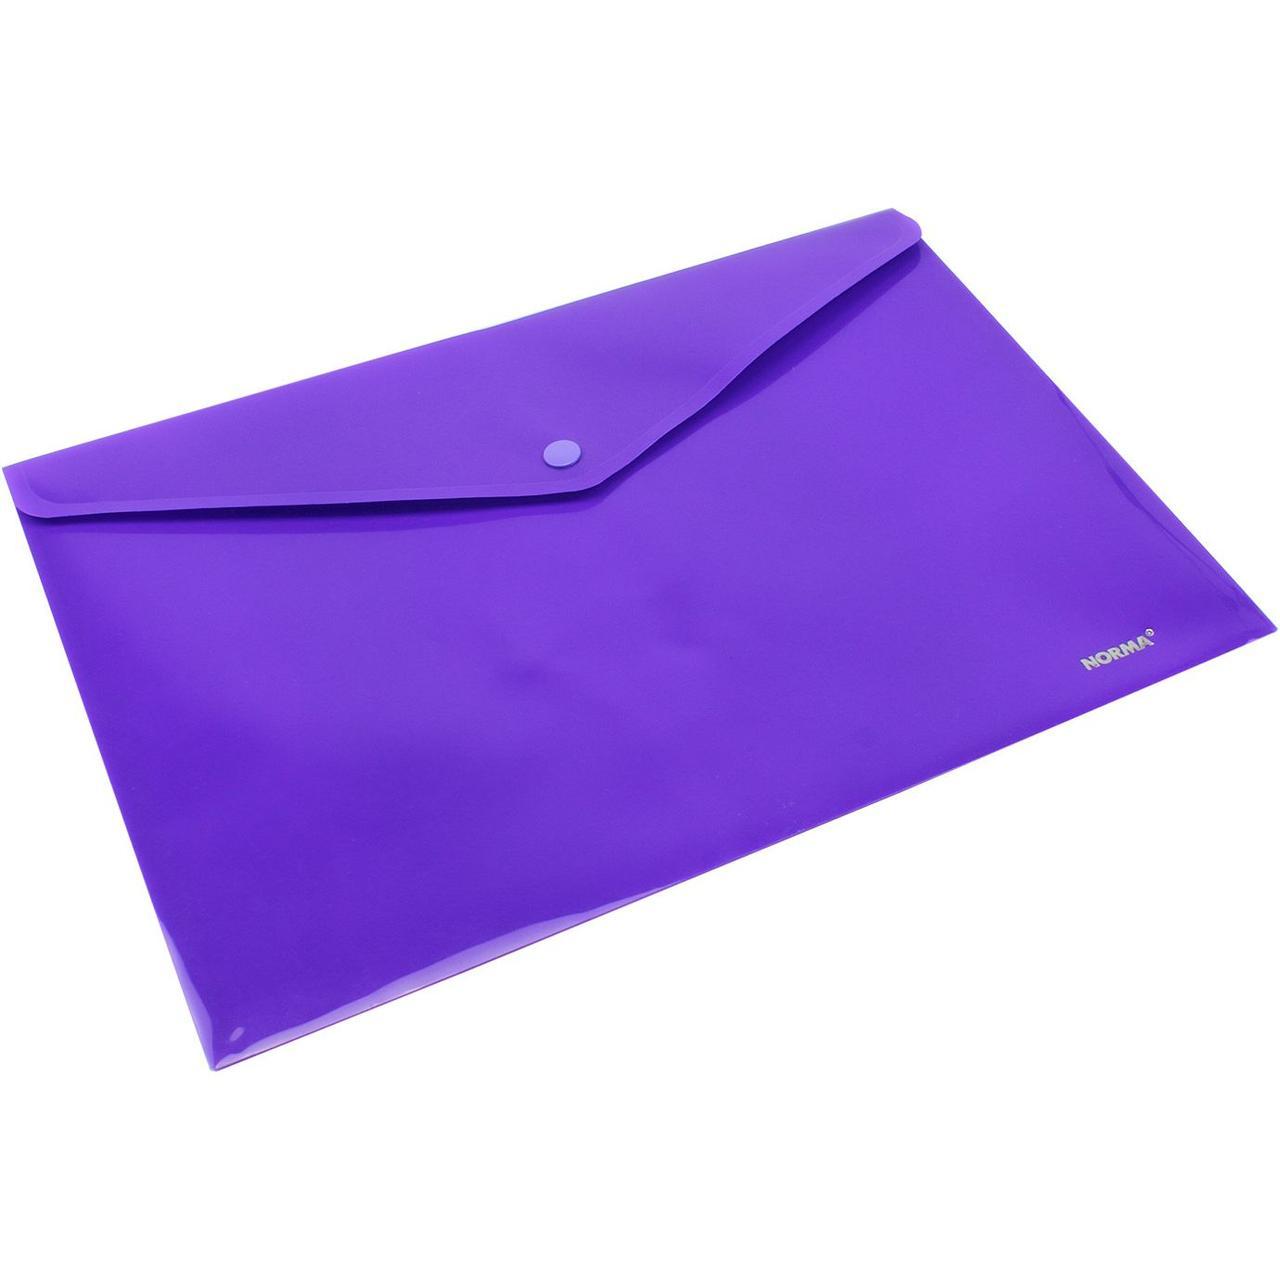 Папка з кнопкою, непрозра, А4, 160 мікрон, фіолетова, 5017, NORMA